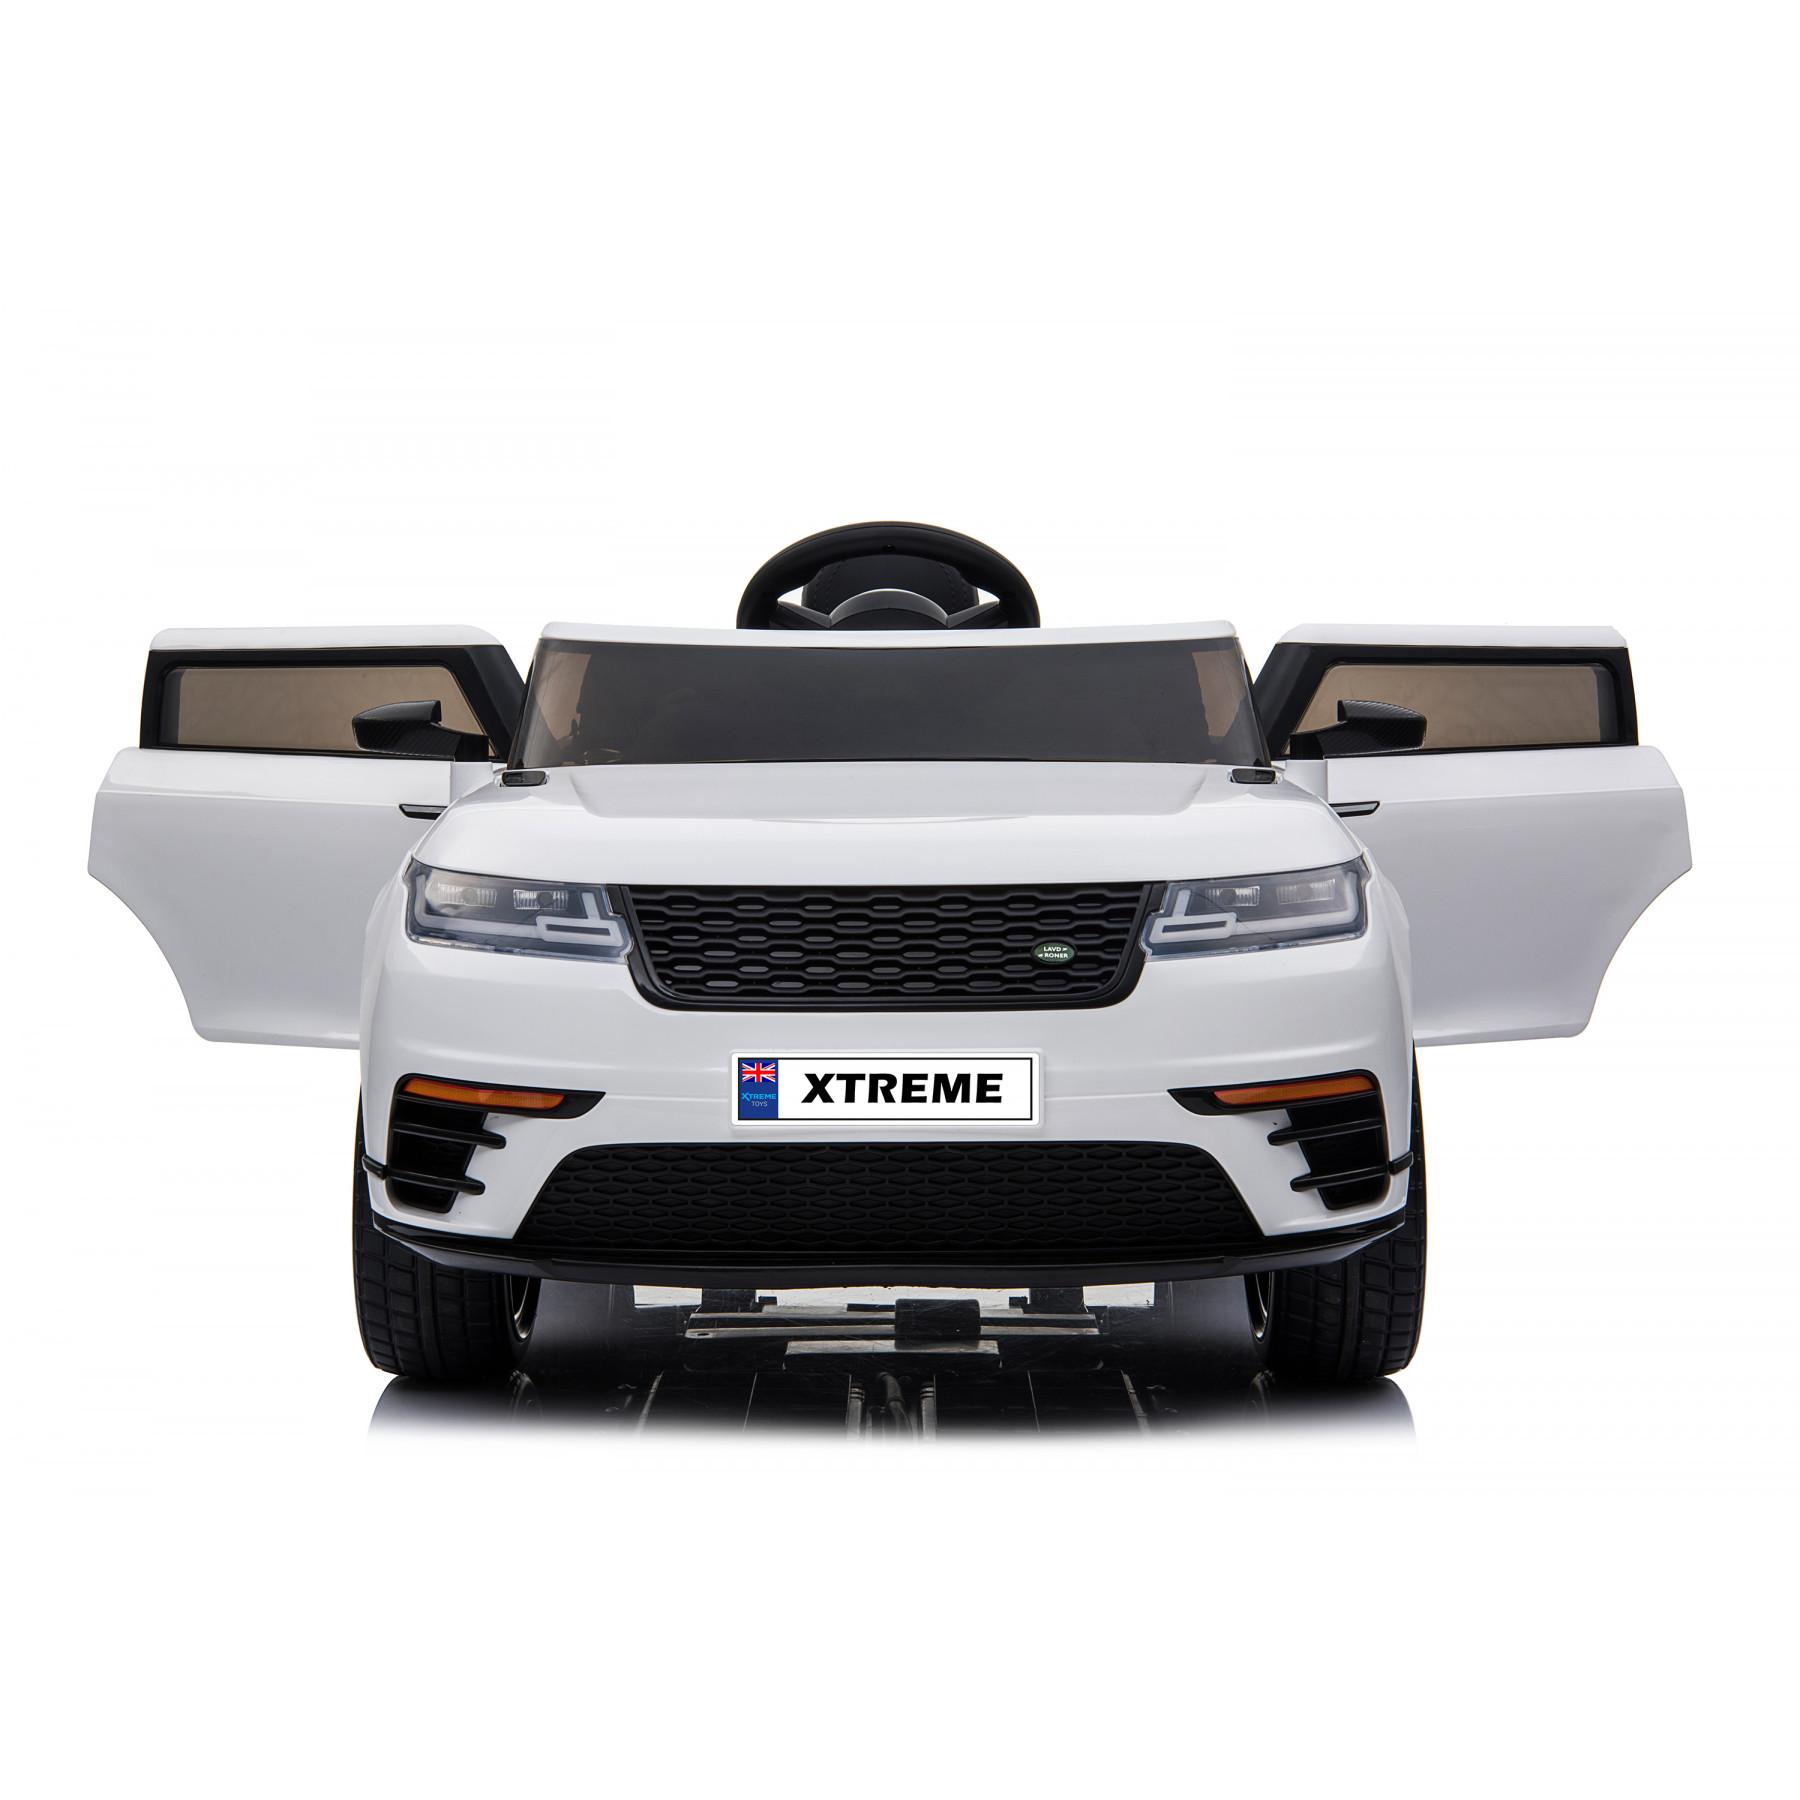 Xtreme 12V  Range Rover Velar Sport Style Ride on Electric Car White